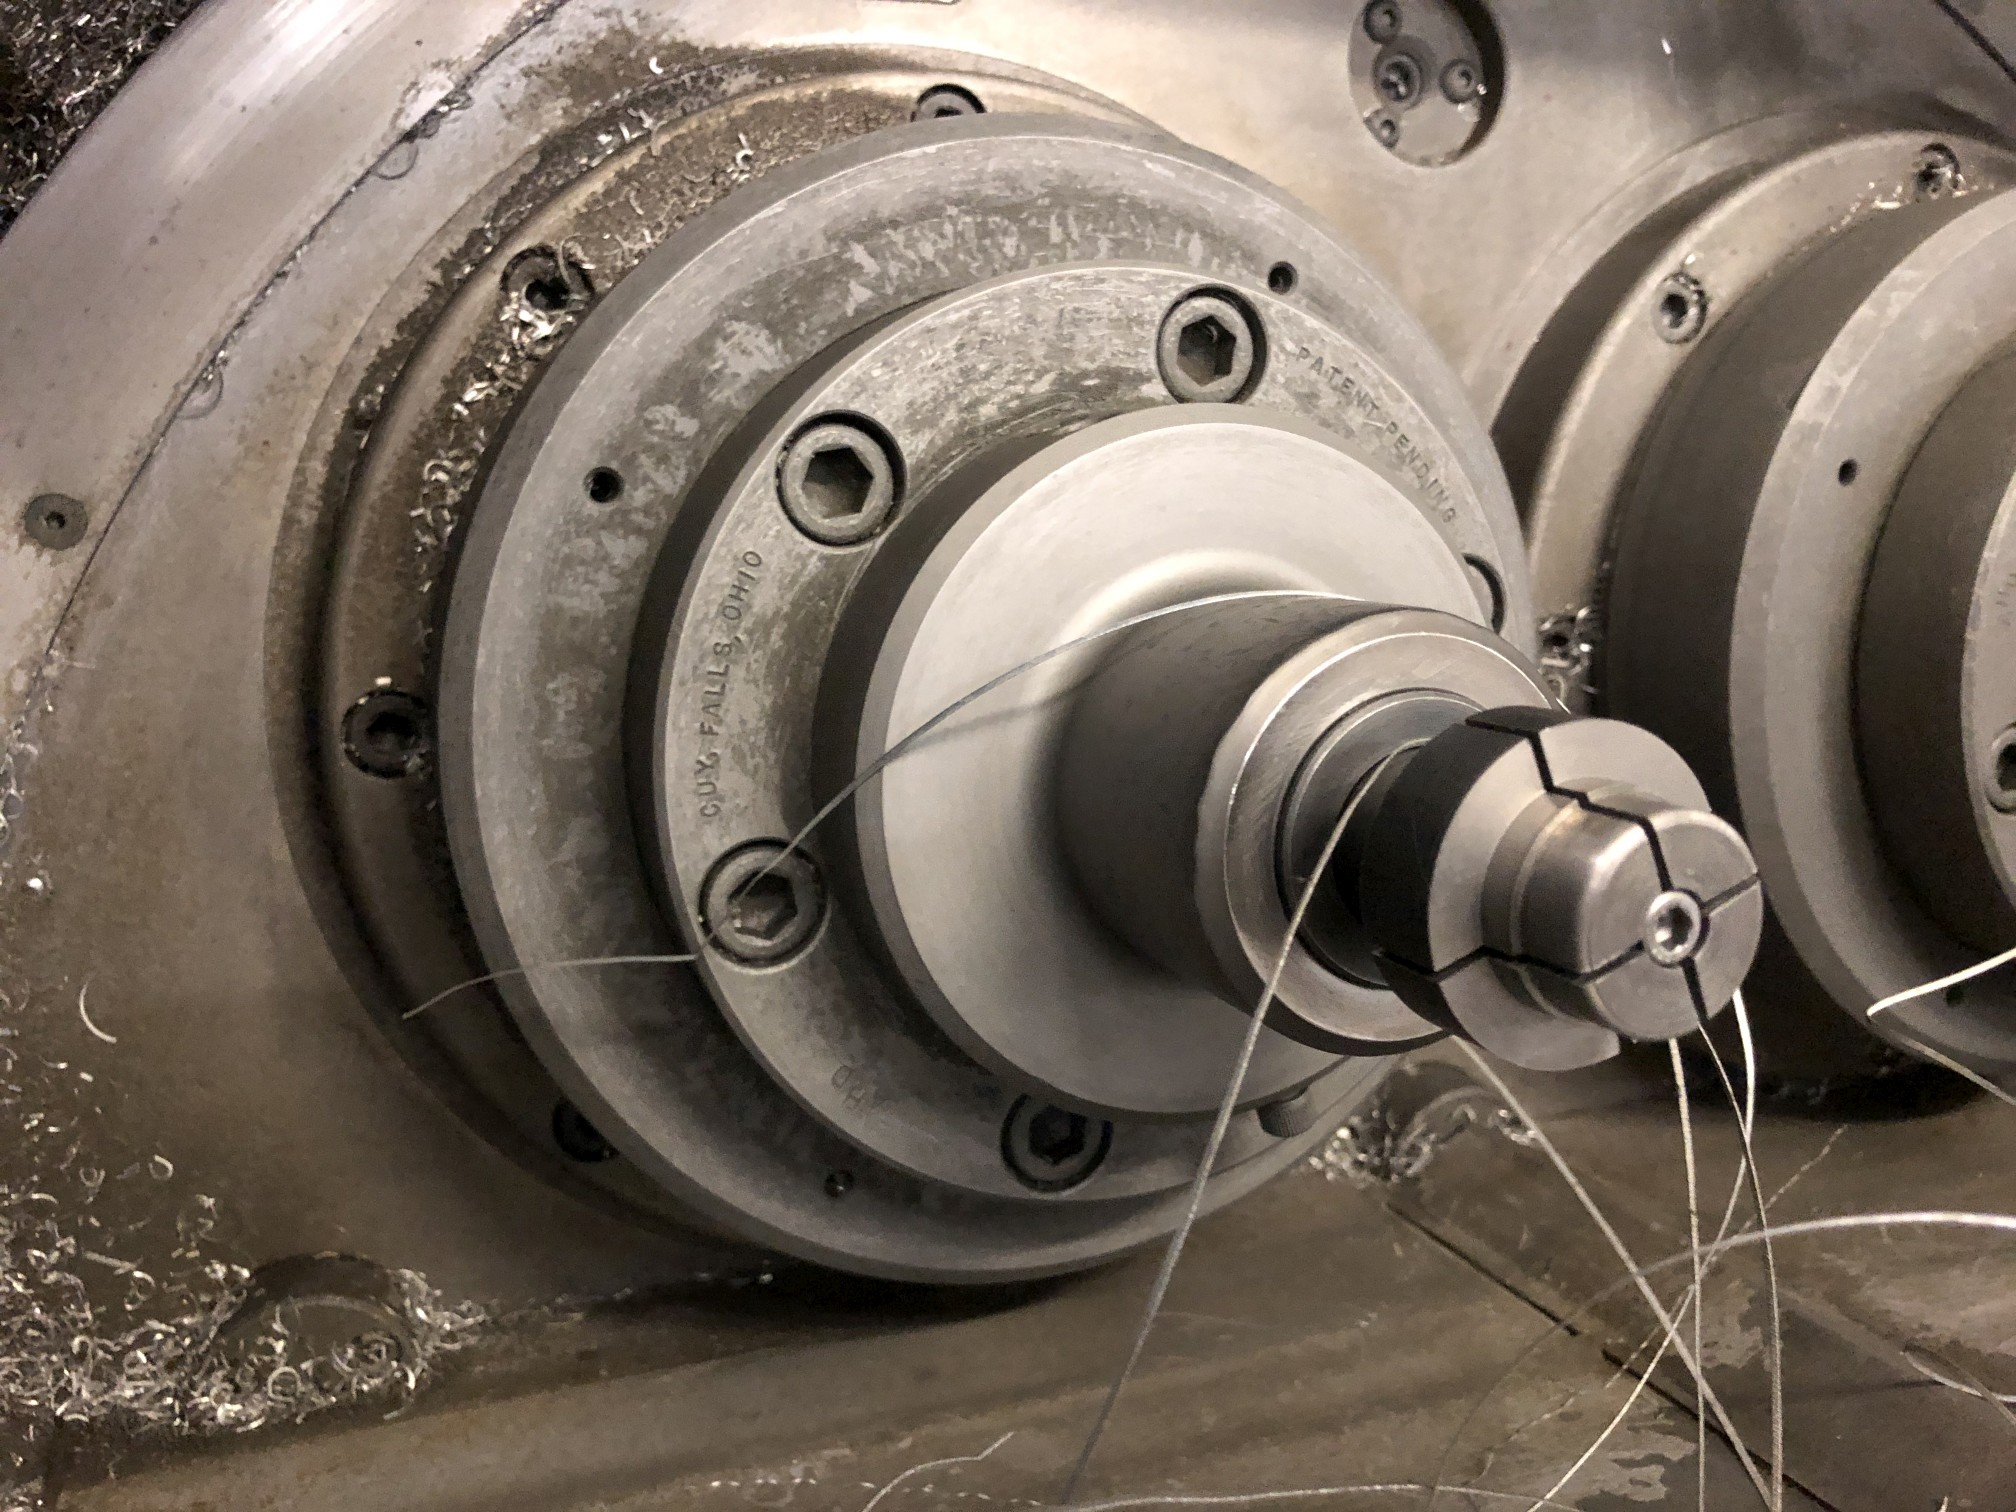 1999 Kitako MT4-200 Multi-Spindle CNC Turning Mill - Image 3 of 16